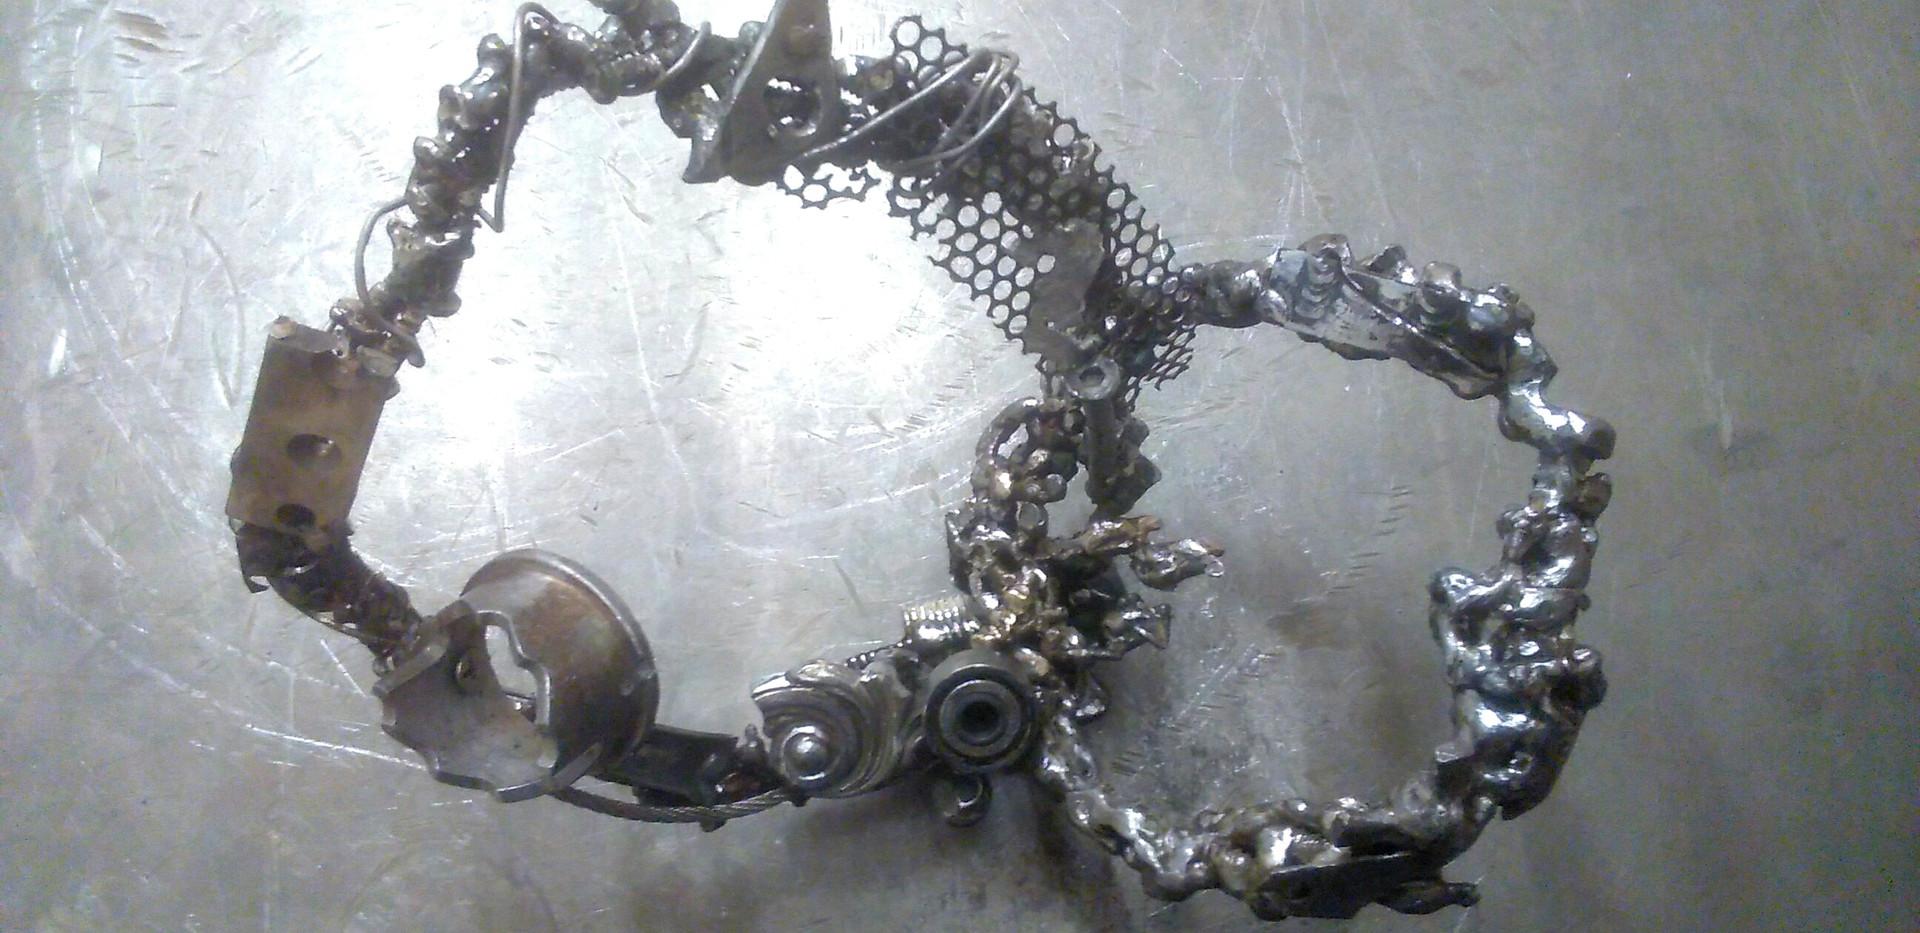 A Double Wreath_welding materials